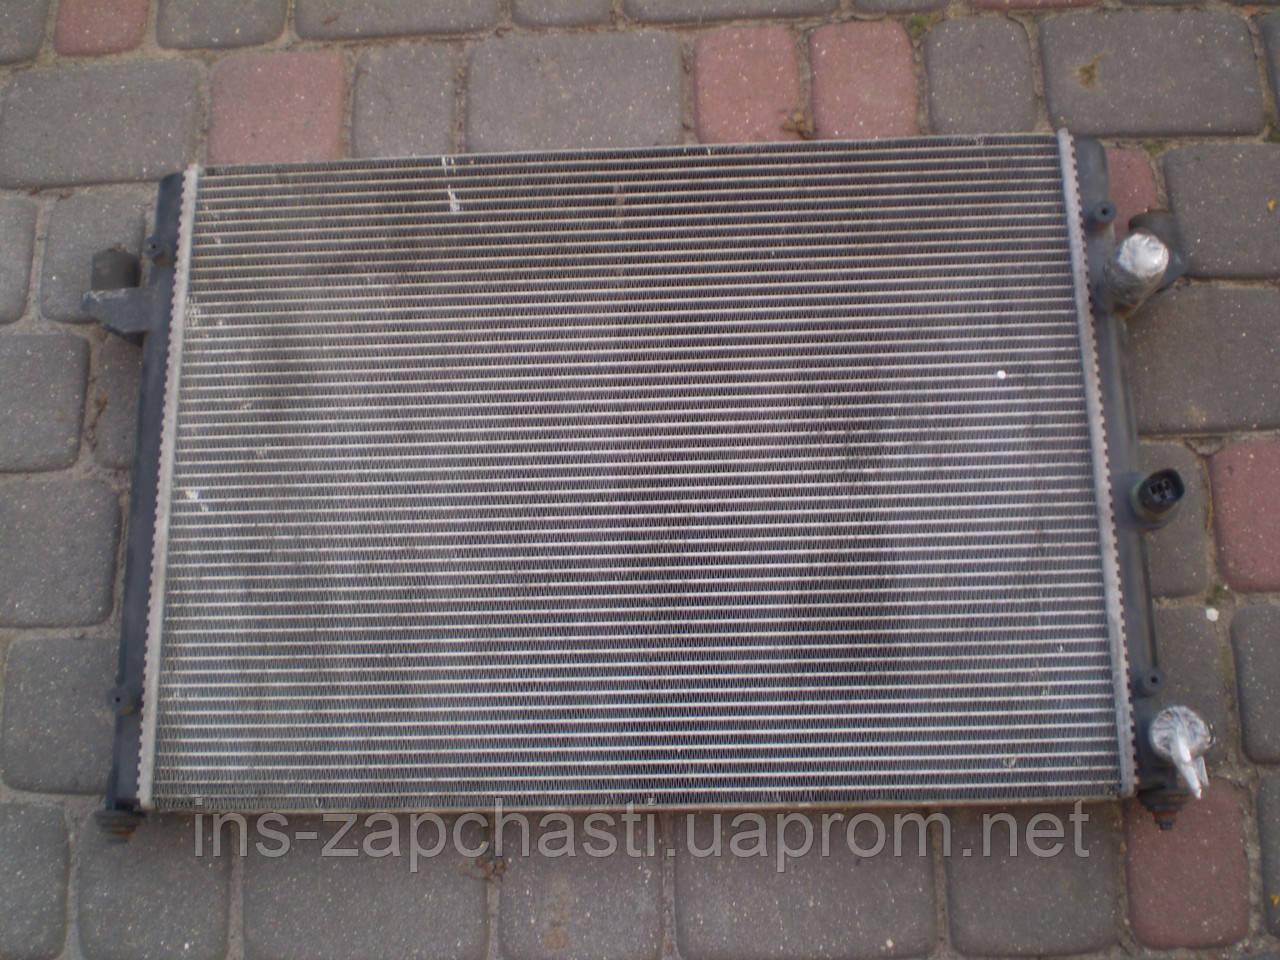 Радиатор охлаждения 7M3 121 253 A Sharan. 2,8 GALAXY. Alhambra. Skoda, AUDI 2000-2010 / 862488E / RA1170